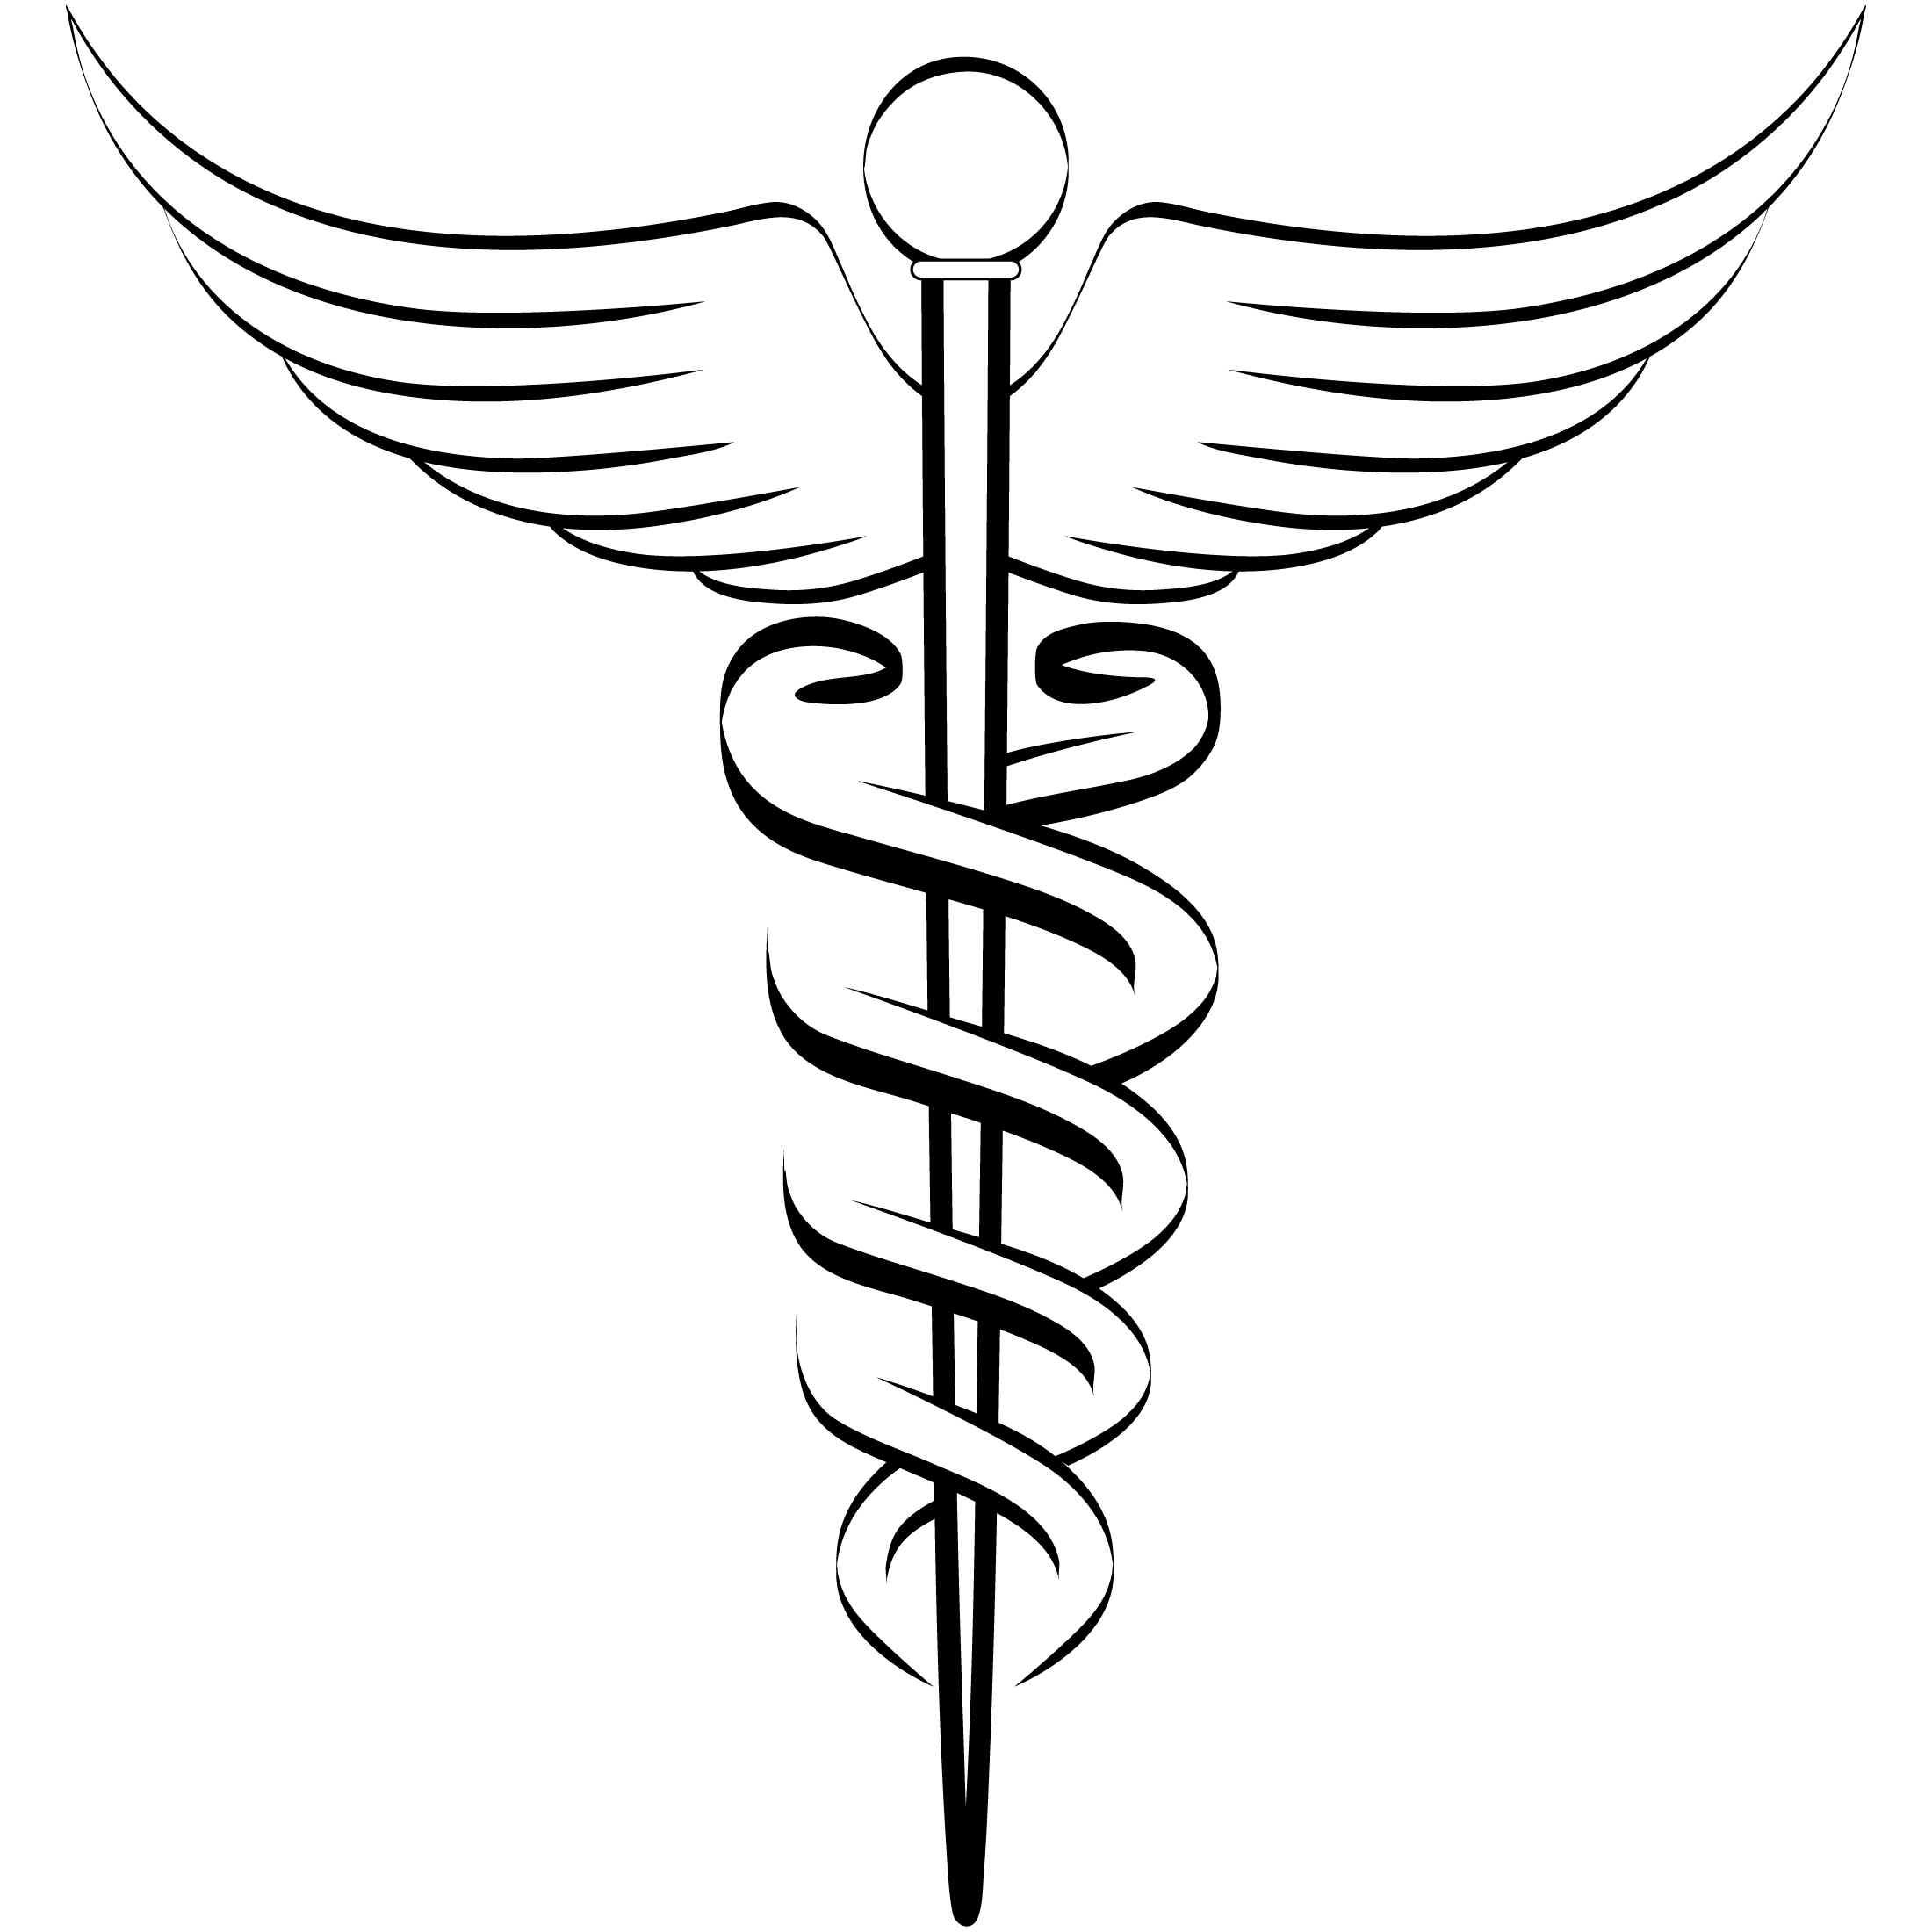 Caduceus tattoos nurse tattoo pinterest caduceus tattoo nurse symbol caduceus tattoo next tattoo biocorpaavc Gallery